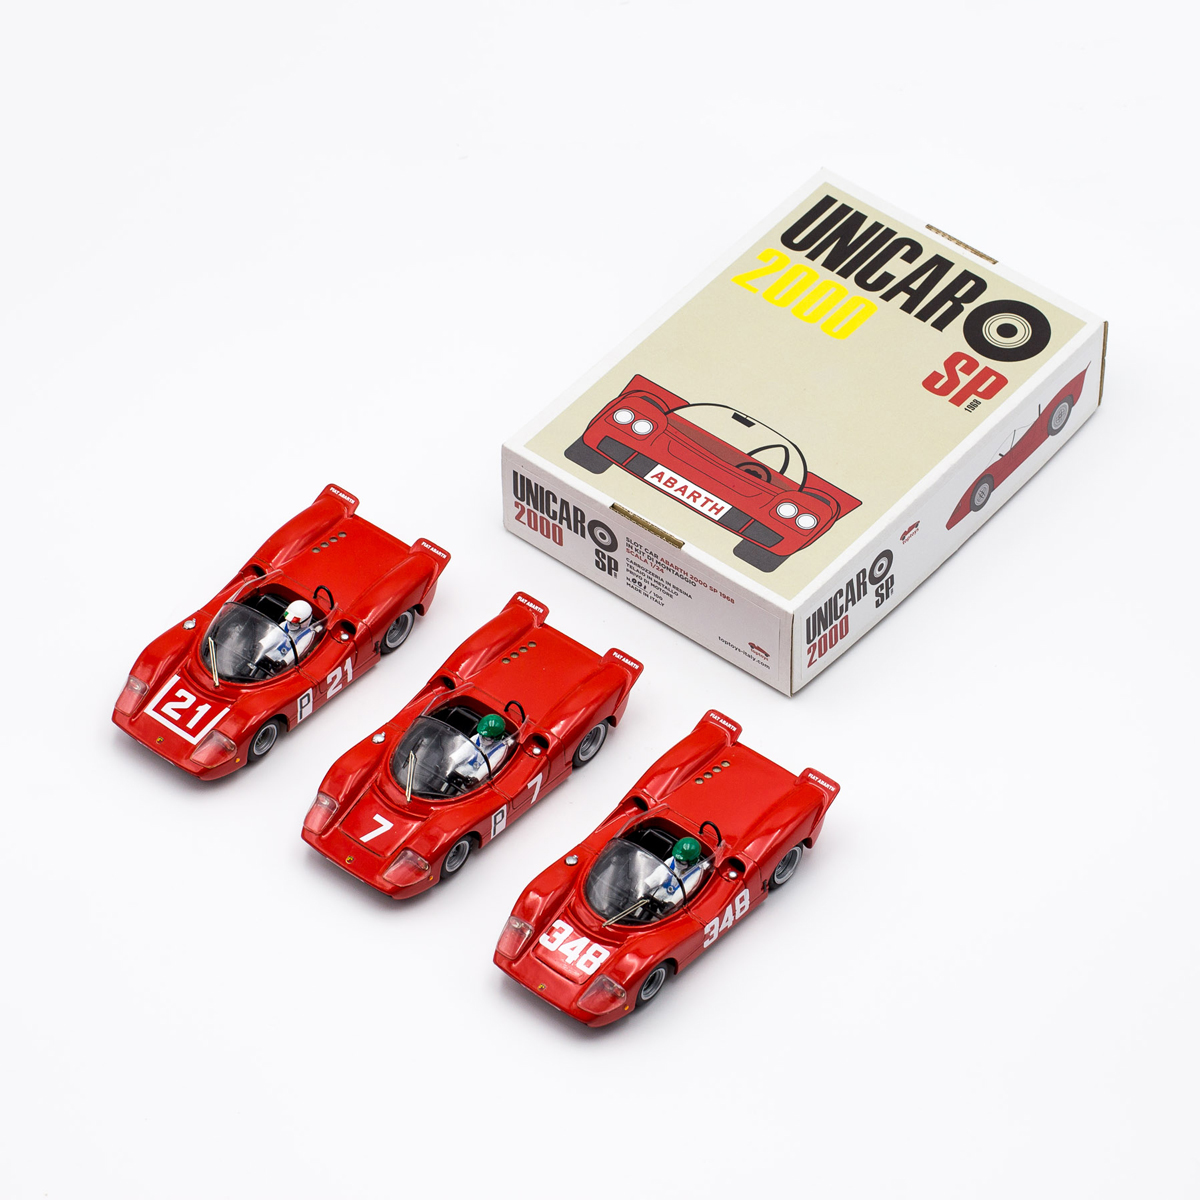 https://www.orlandinifrancesco.com/wp/wp-content/uploads/2019/05/Slot-Car-Kit-Abarth-2000-SP-Unicar-3123.jpg